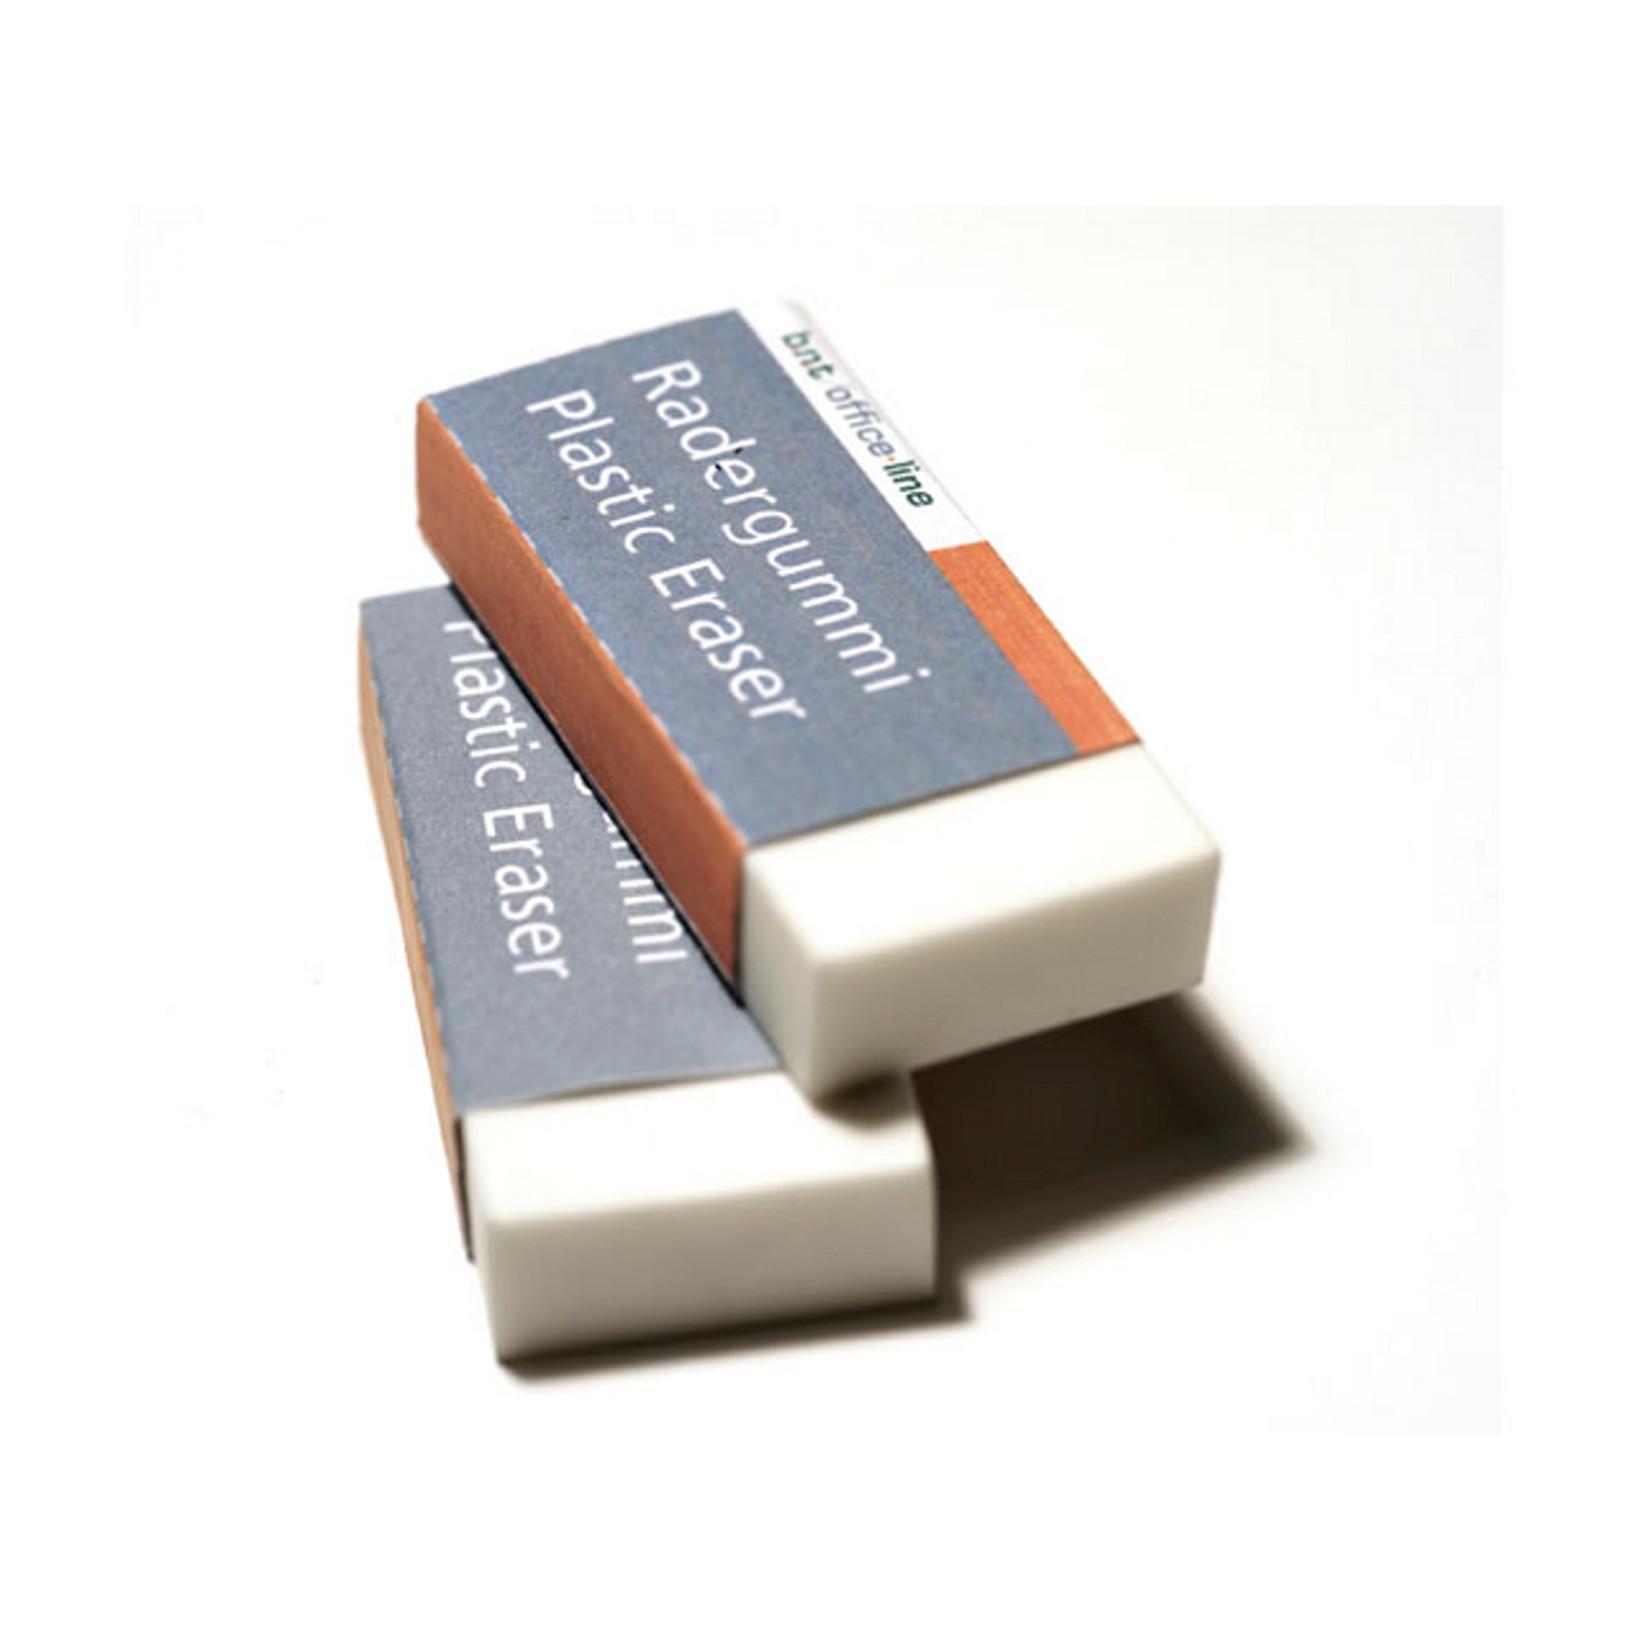 Viskelæder PVC fri - 62 x 22 x 10 mm